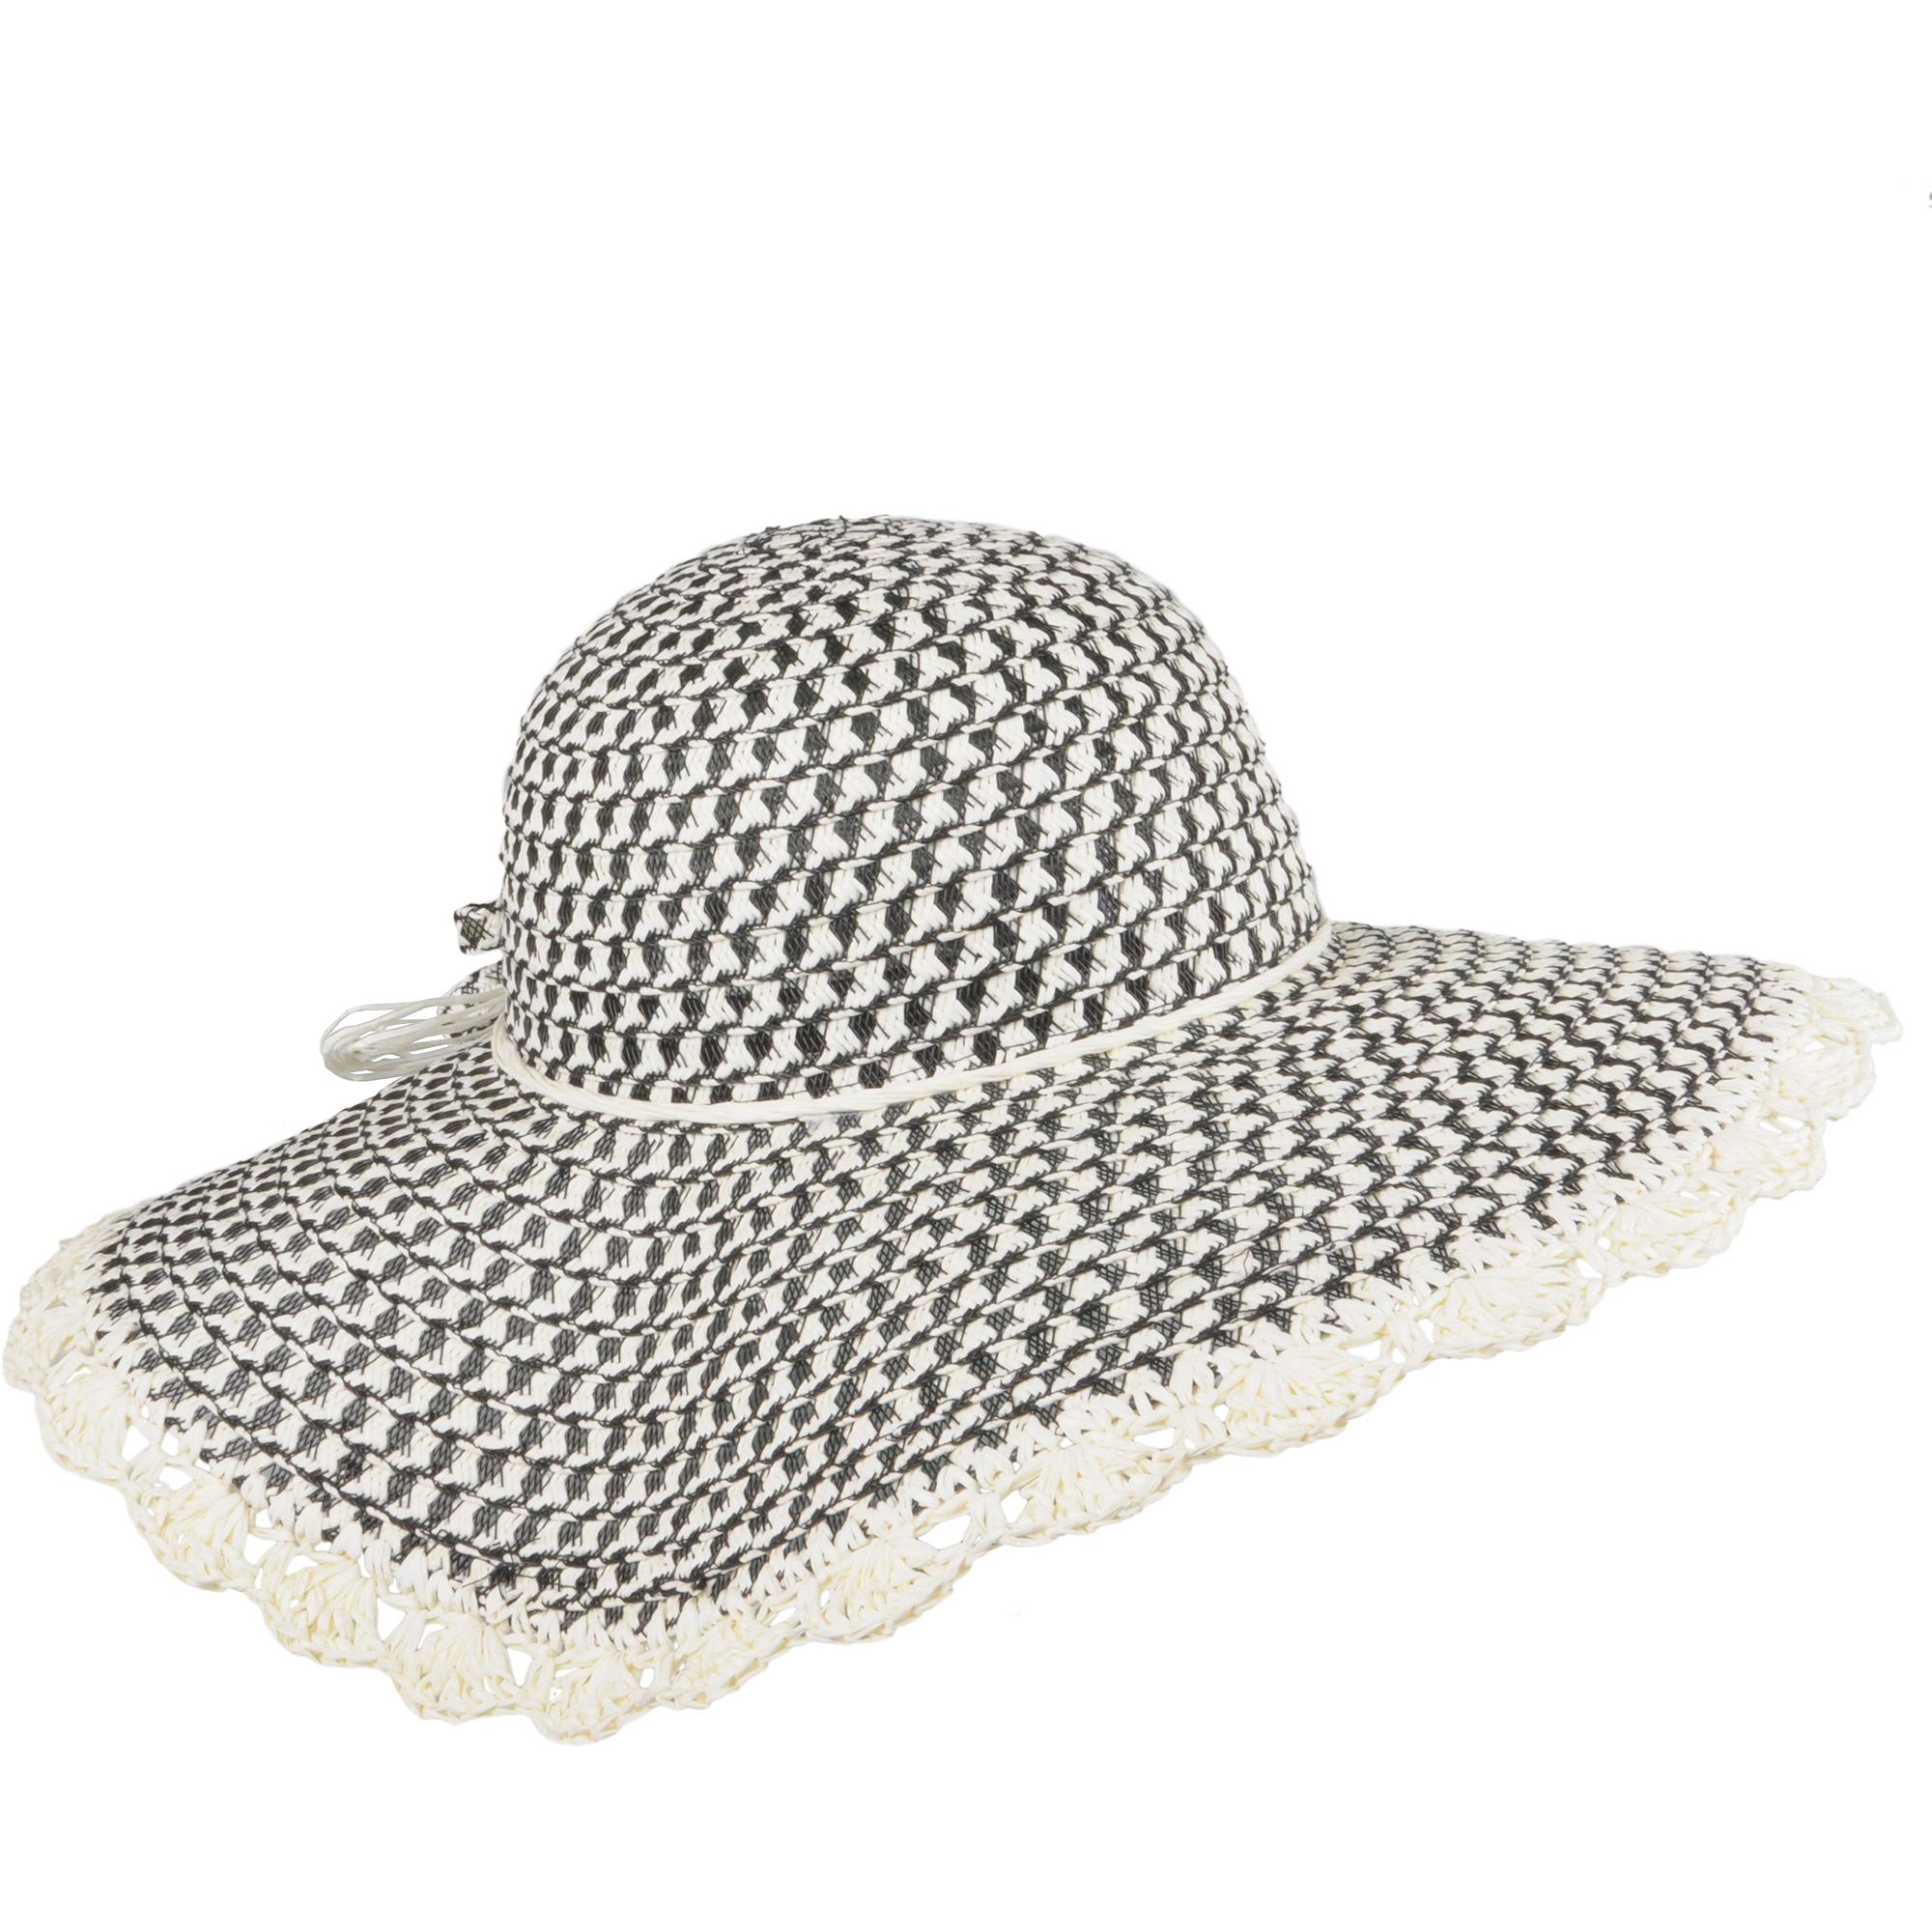 Brinley Co. Womens Bow Accent Brim Paper Hat